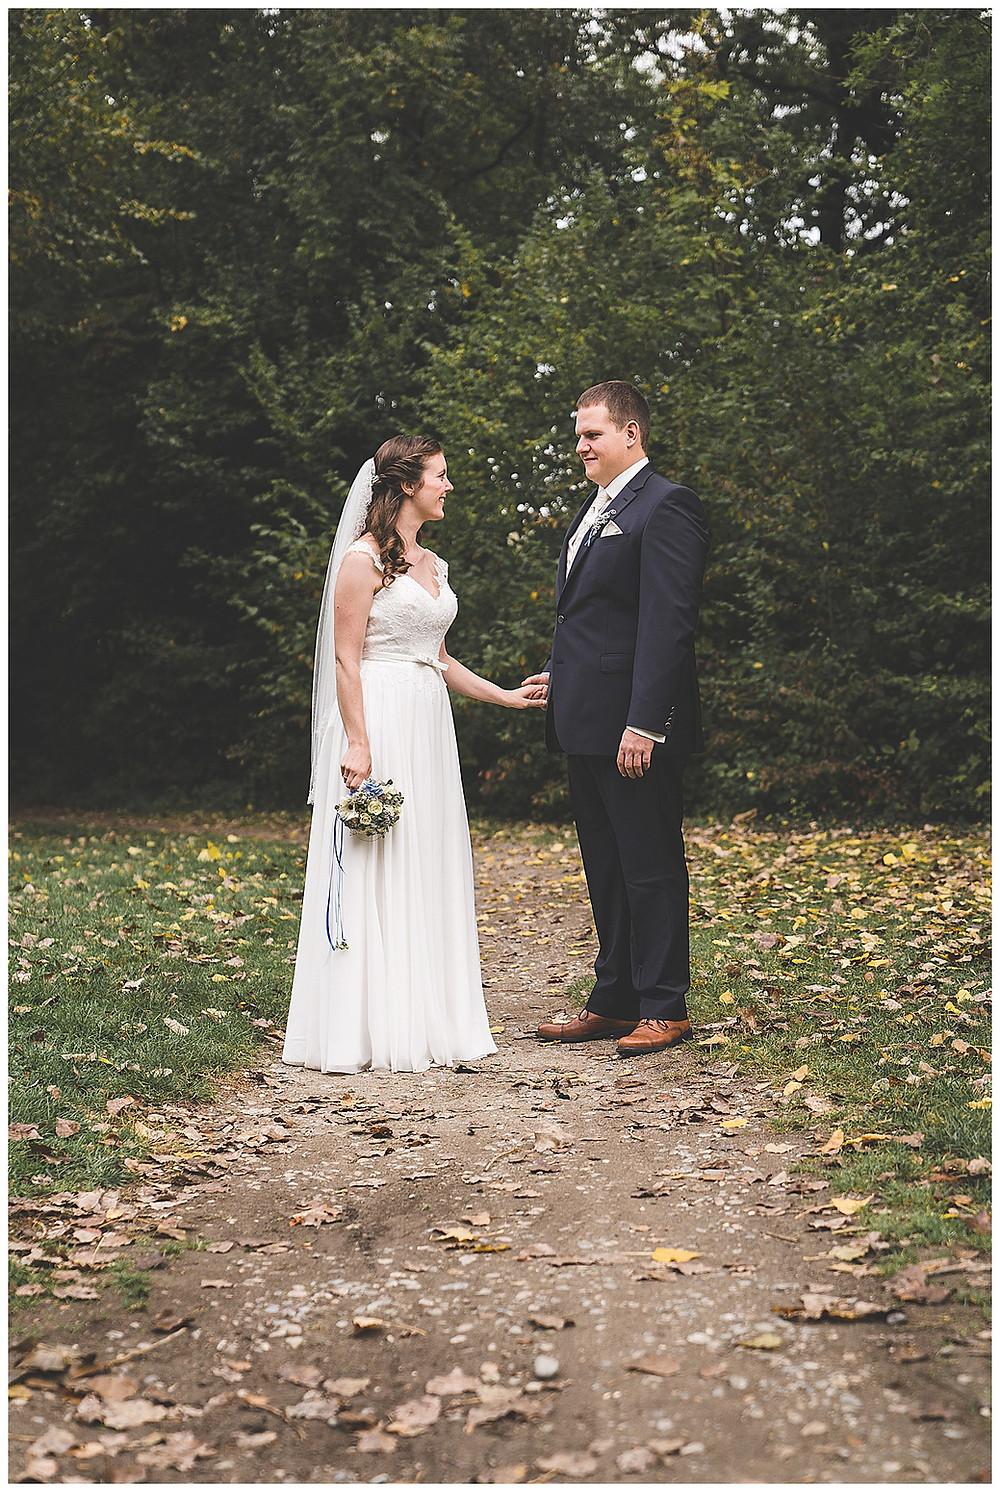 Brautpaarfotos Biberach